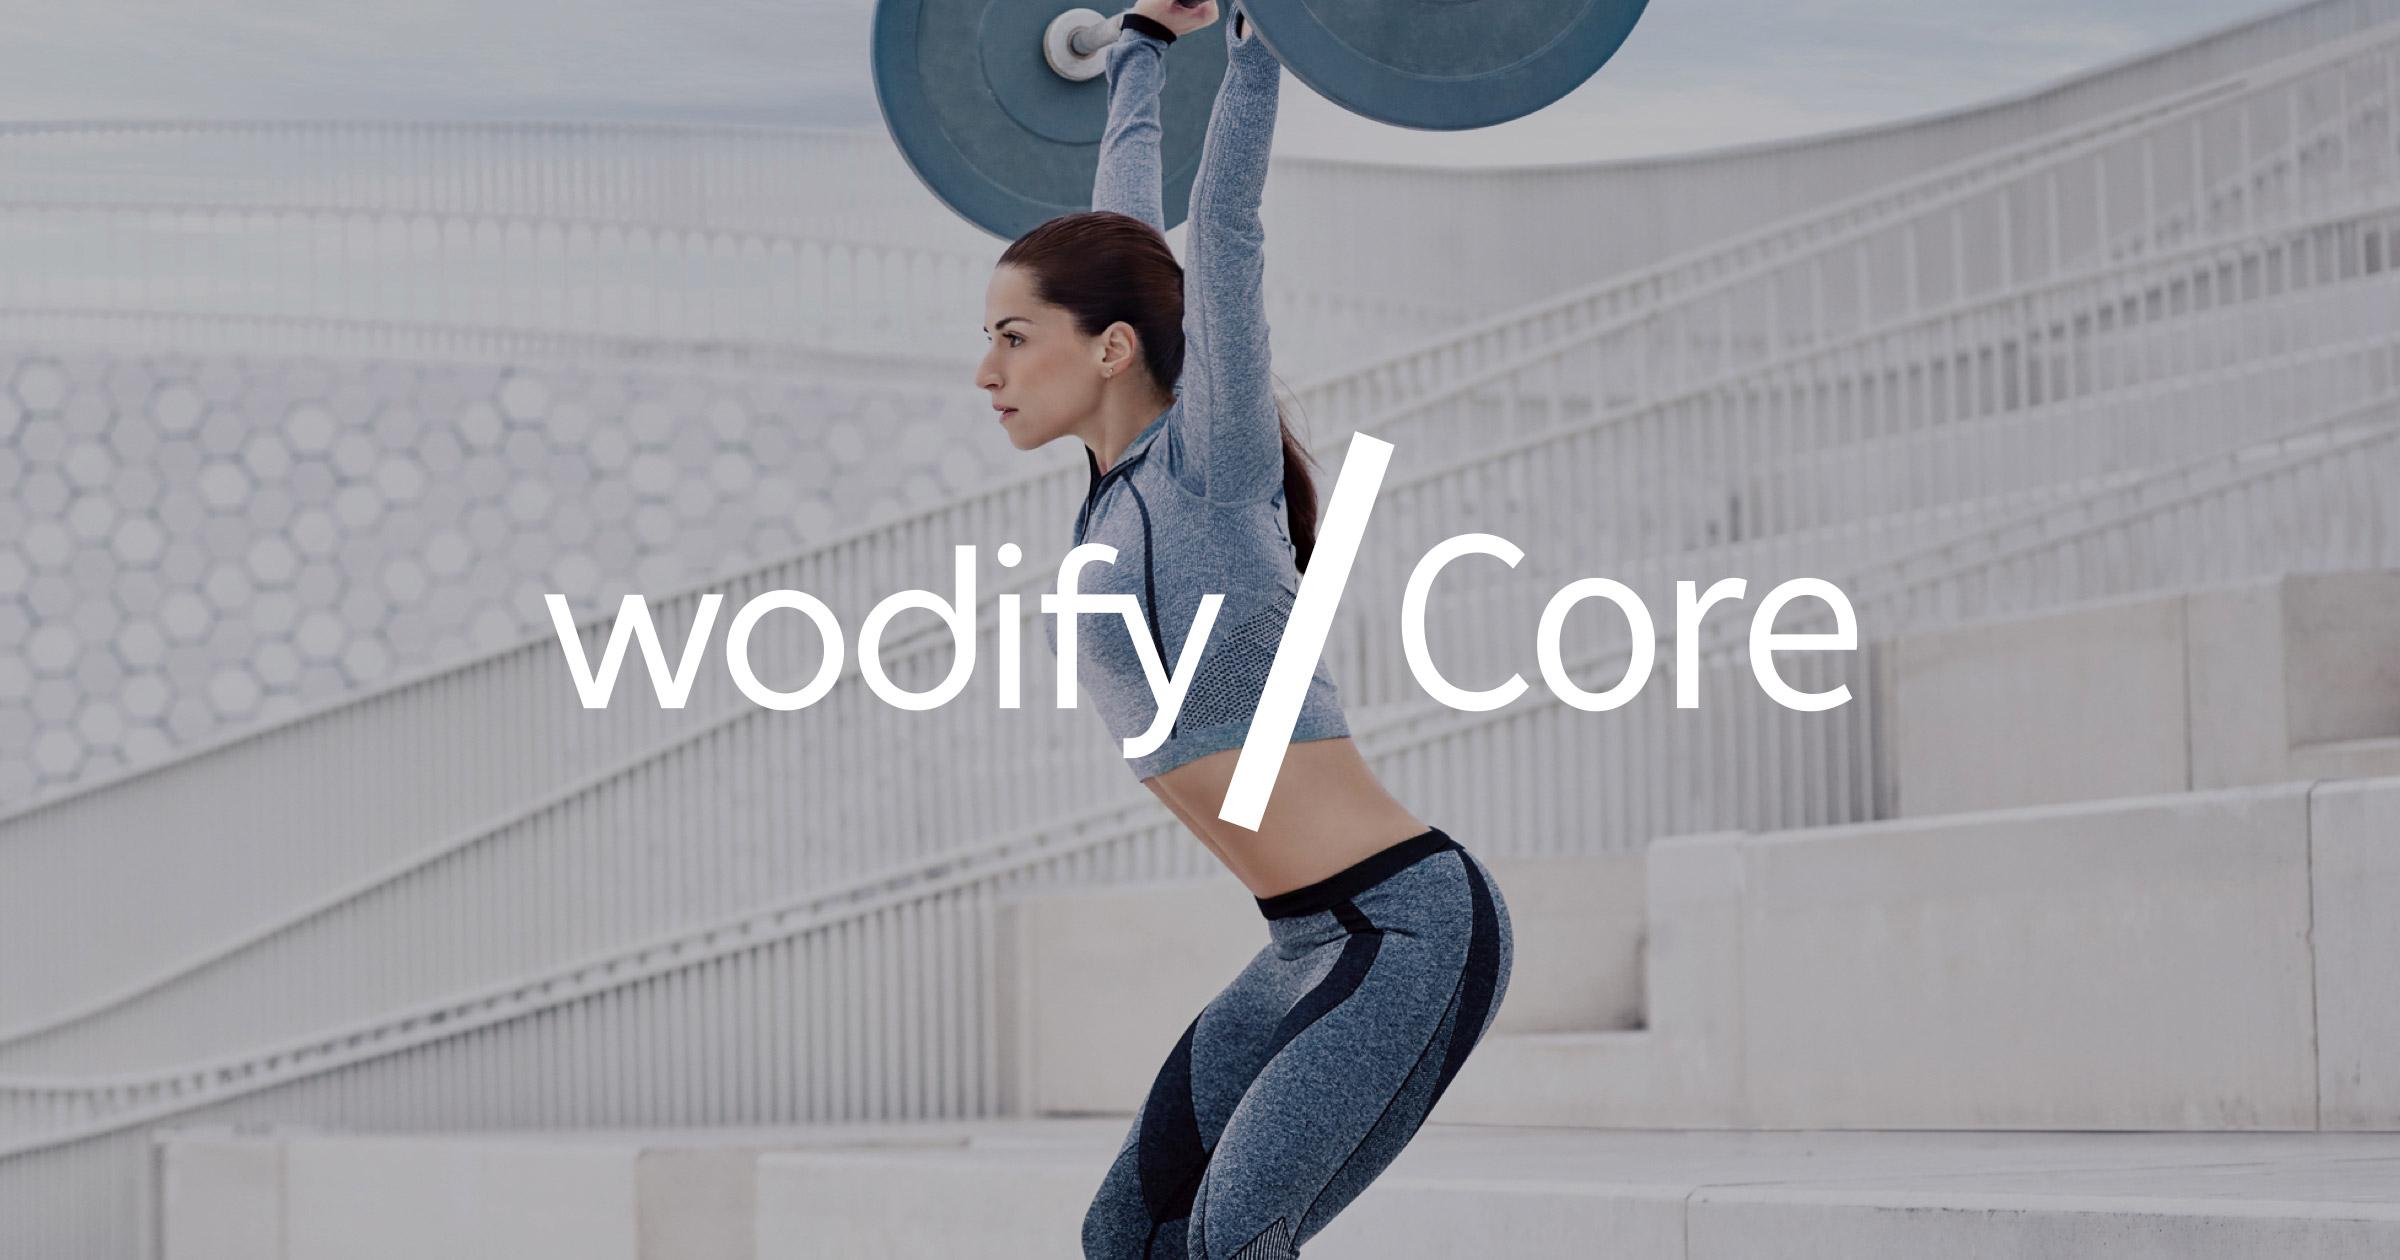 Fitness gym management platform wodify technologies